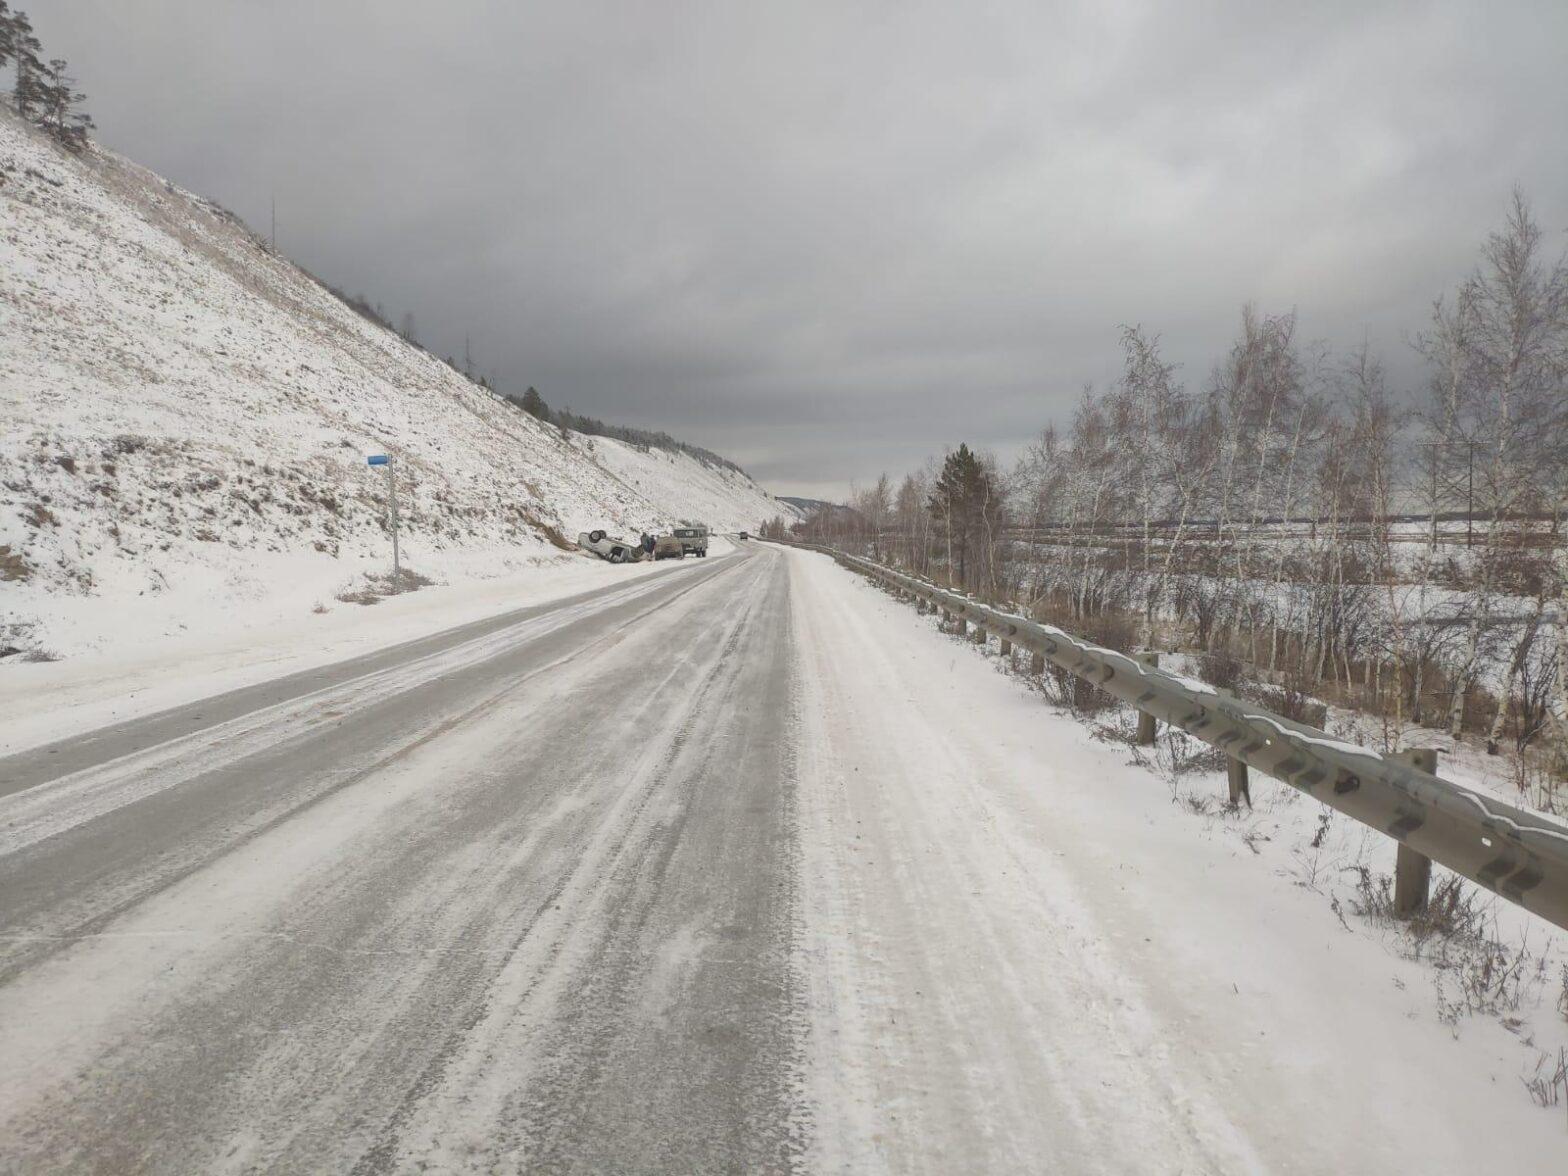 Свыше 20 ДТП зарегистрировали на дорогах Якутии за сутки